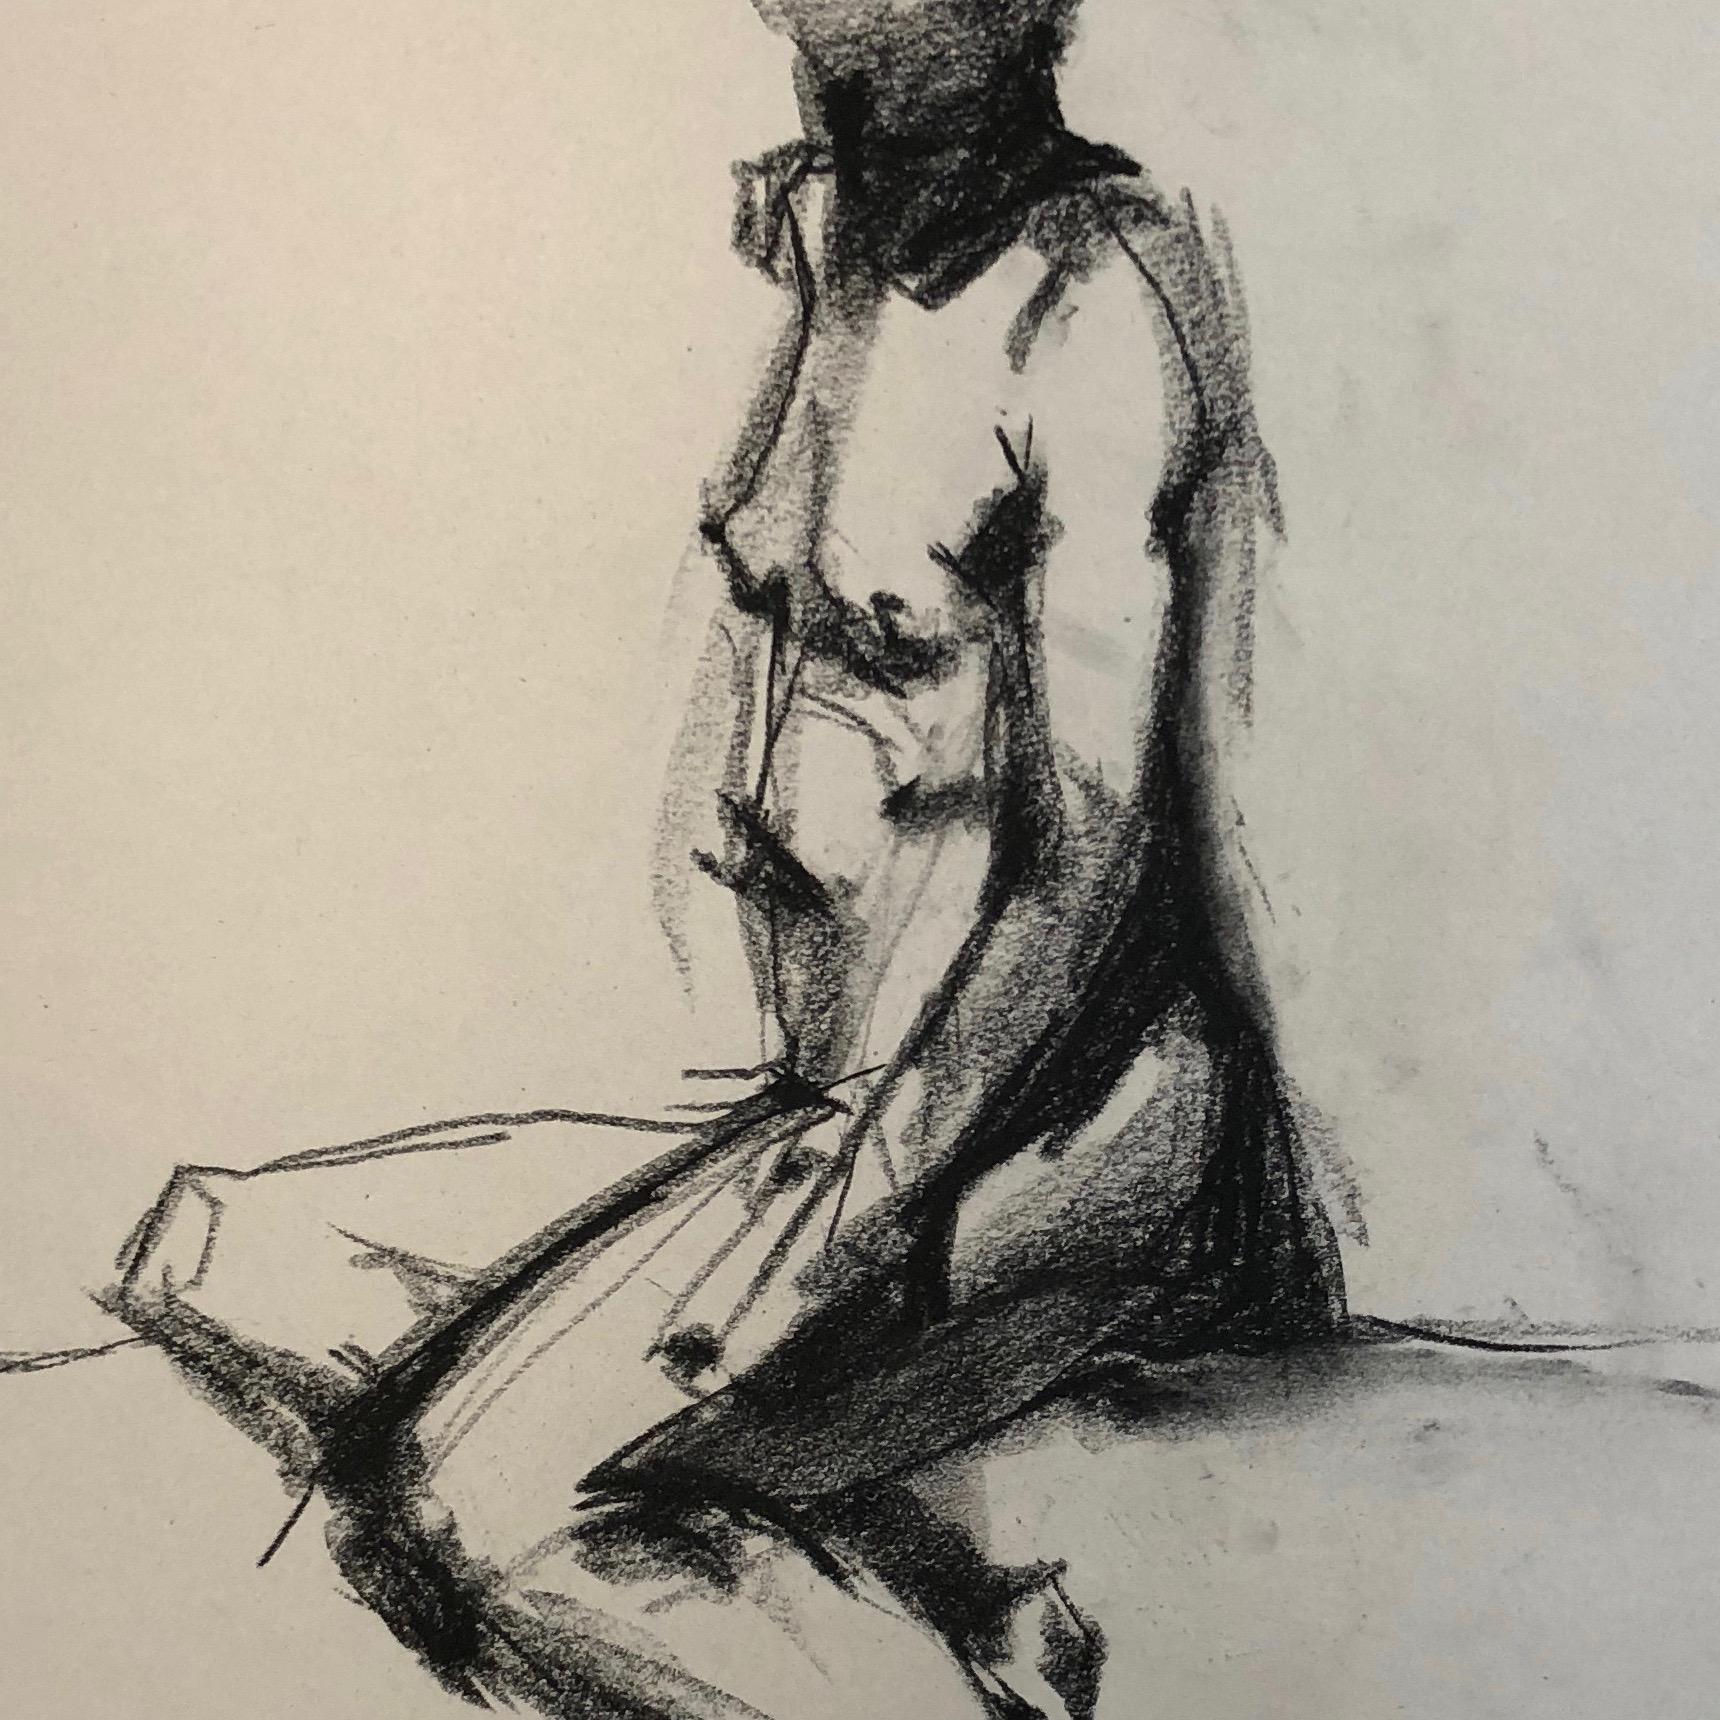 Figurative Gesture 218